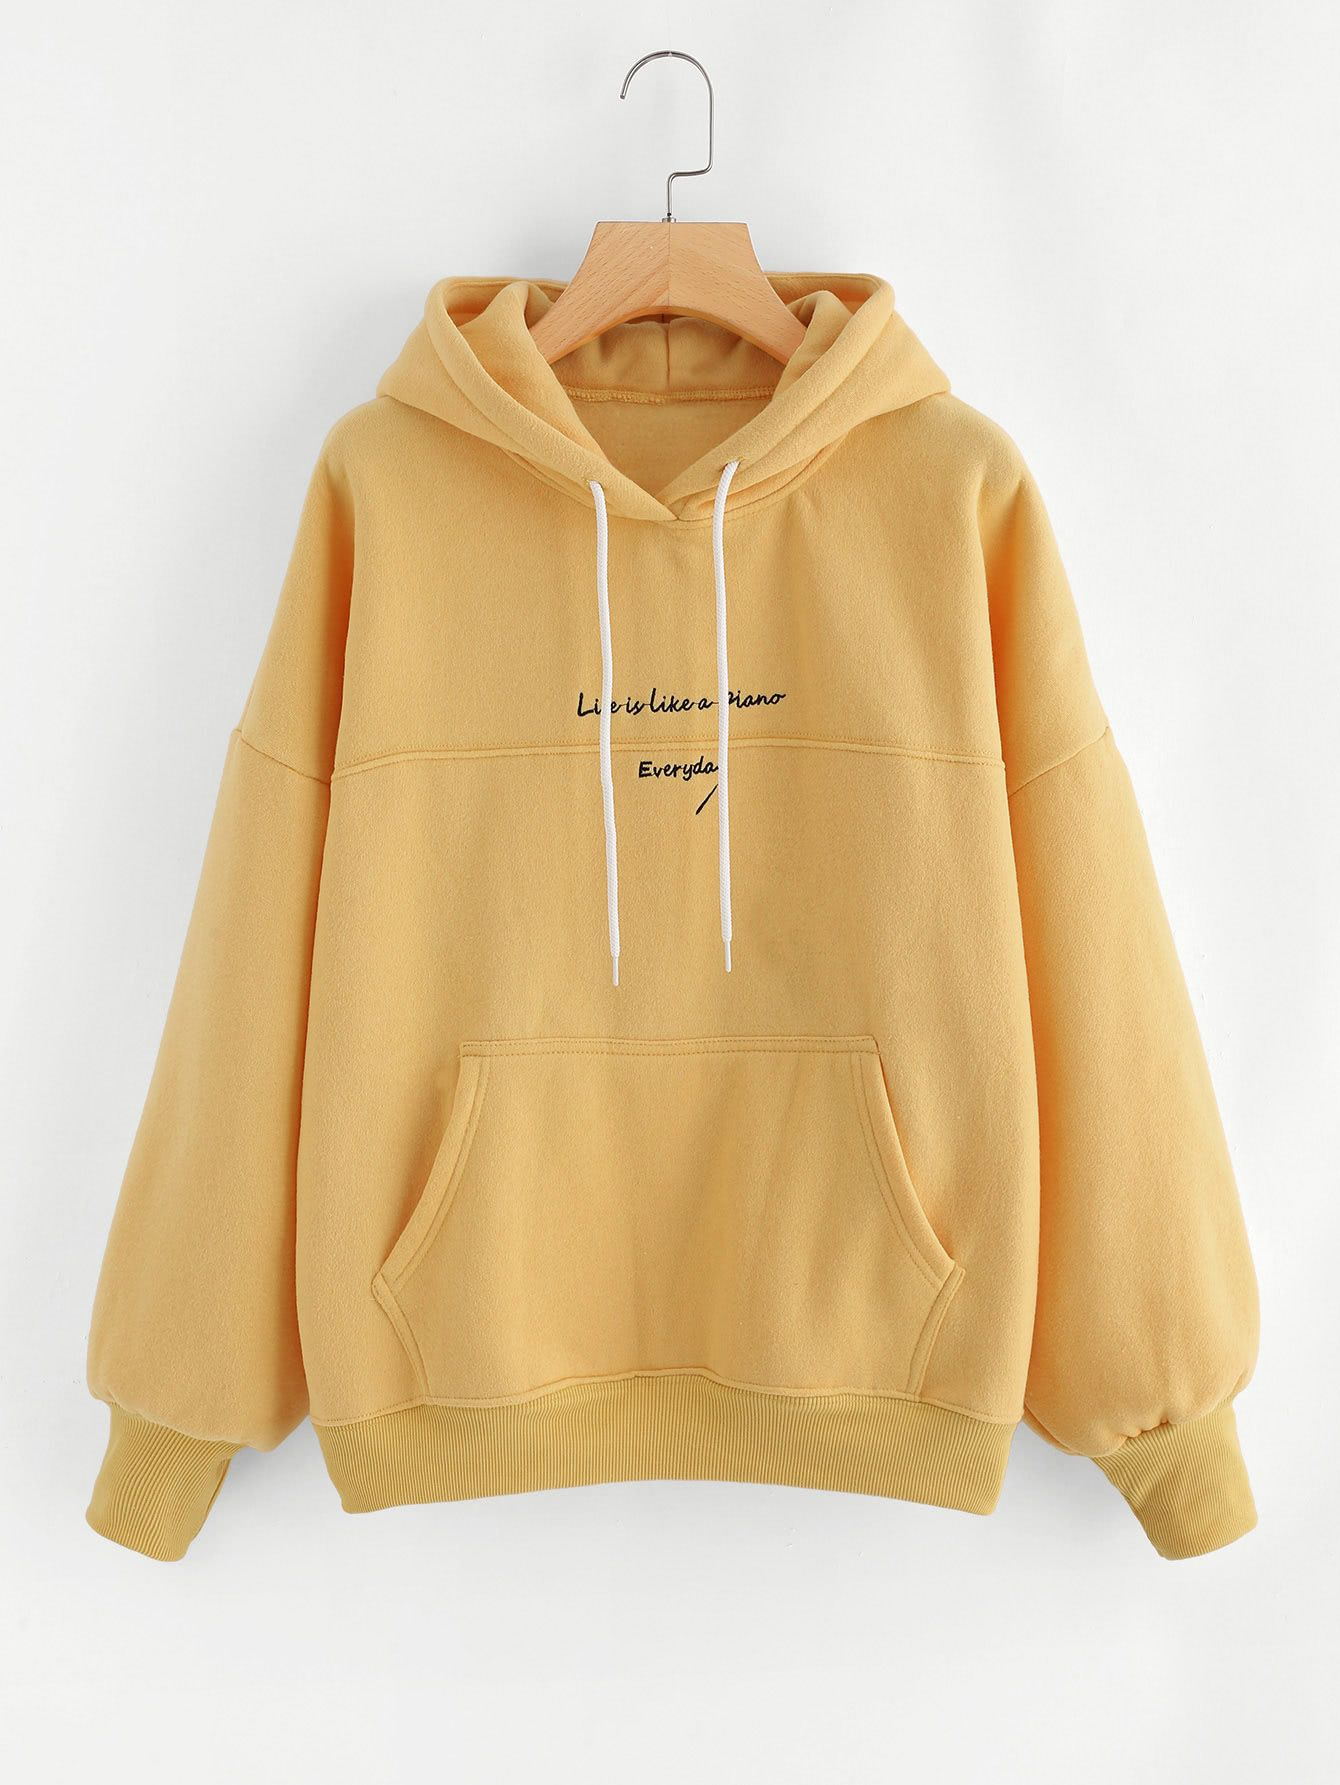 Shop Slogan Embroidery Hoodie Online Shein Offers Slogan Embroidery Hoodie More To Fit Your Fashionable N Stylish Hoodies Trendy Hoodies Cute Casual Outfits [ 1785 x 1340 Pixel ]